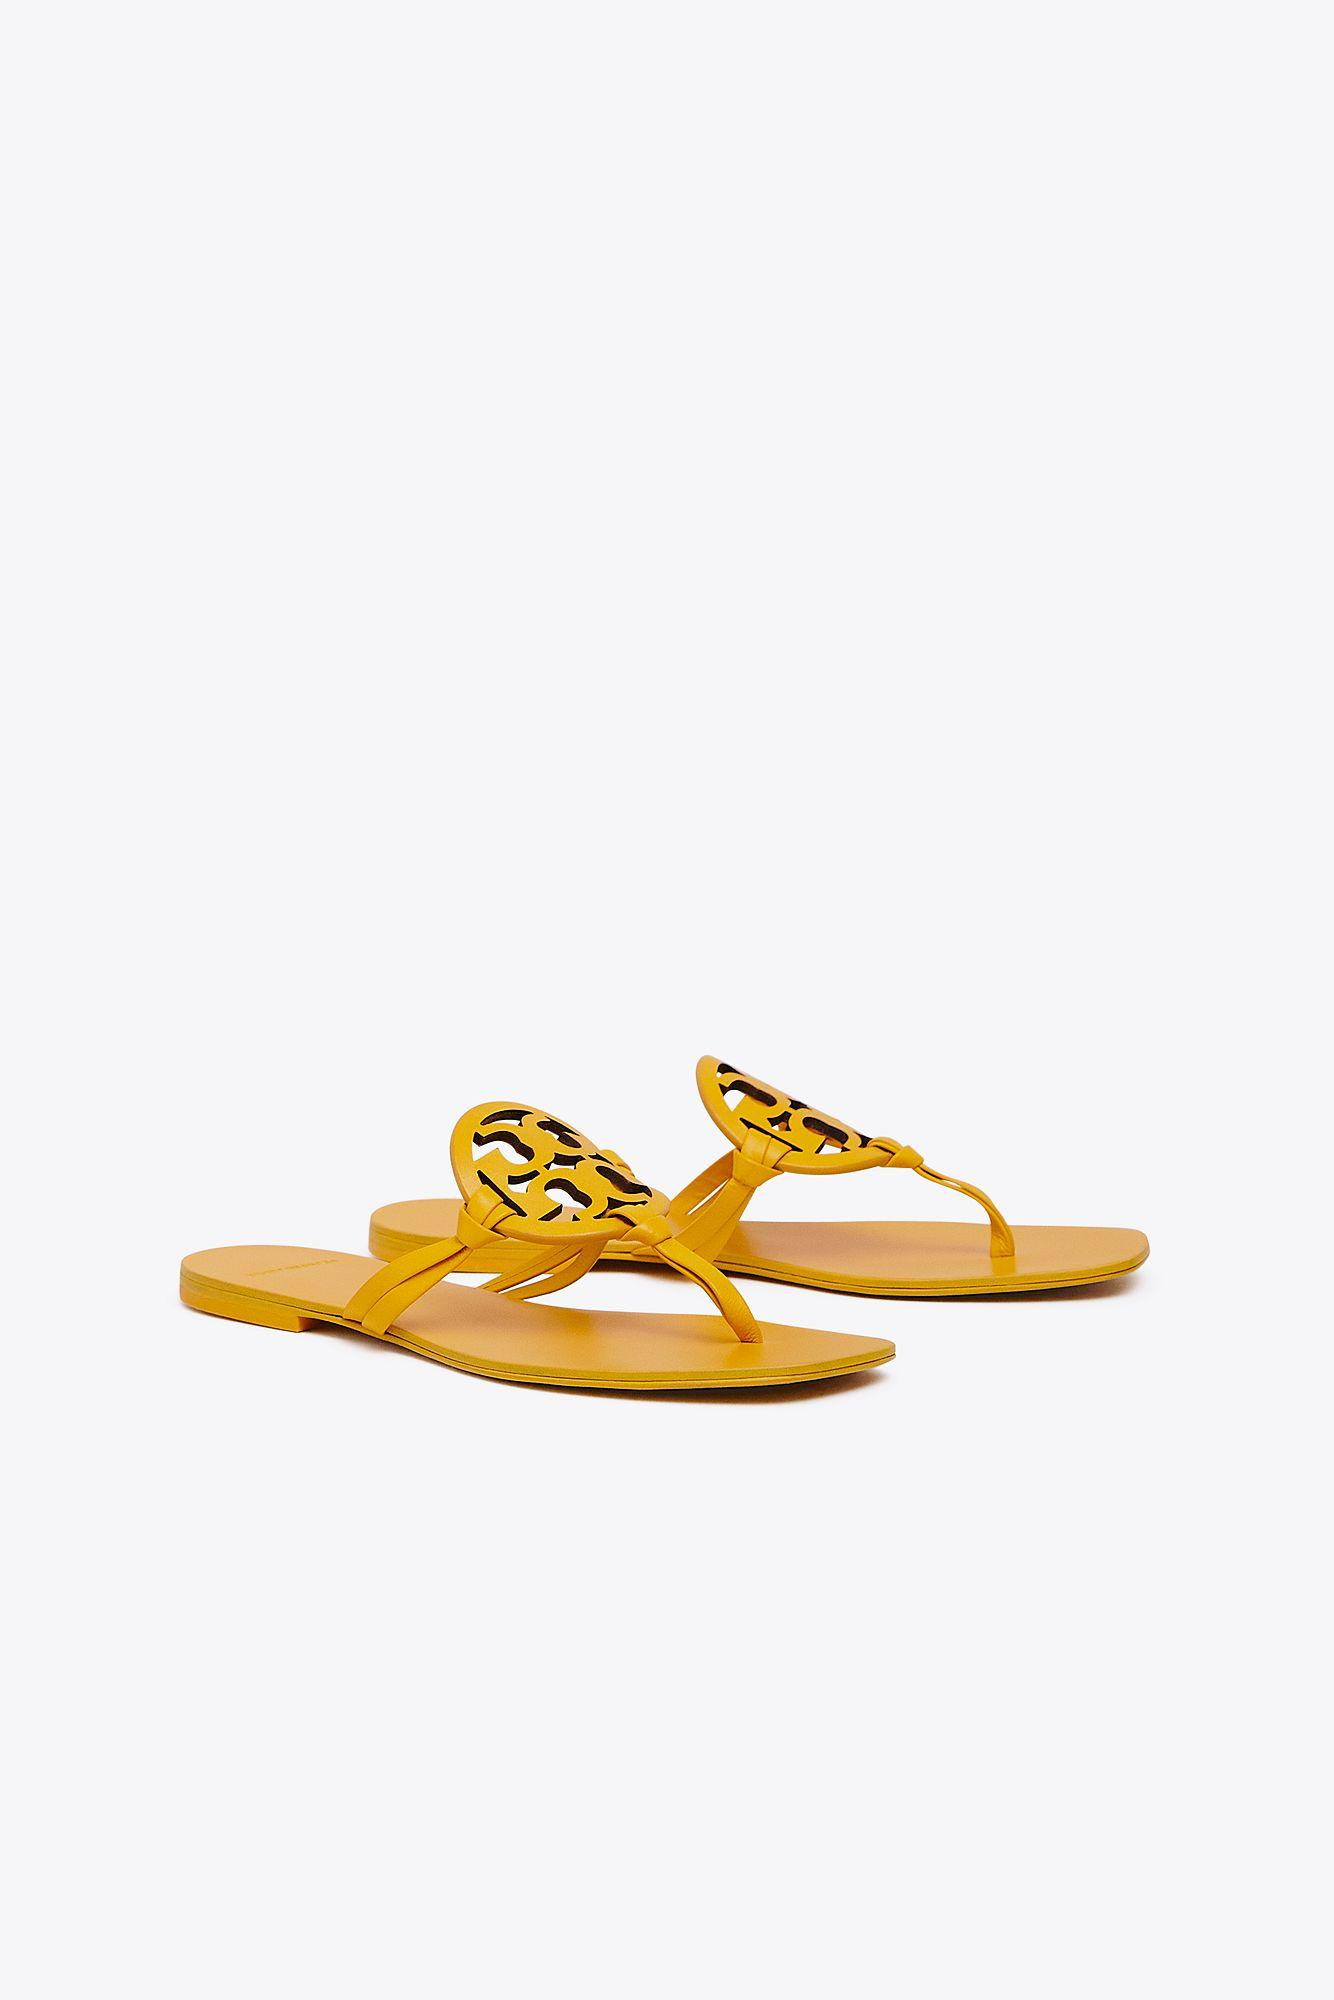 7a29ae363ab7b ... Flat Sandals - Lyst. View fullscreen